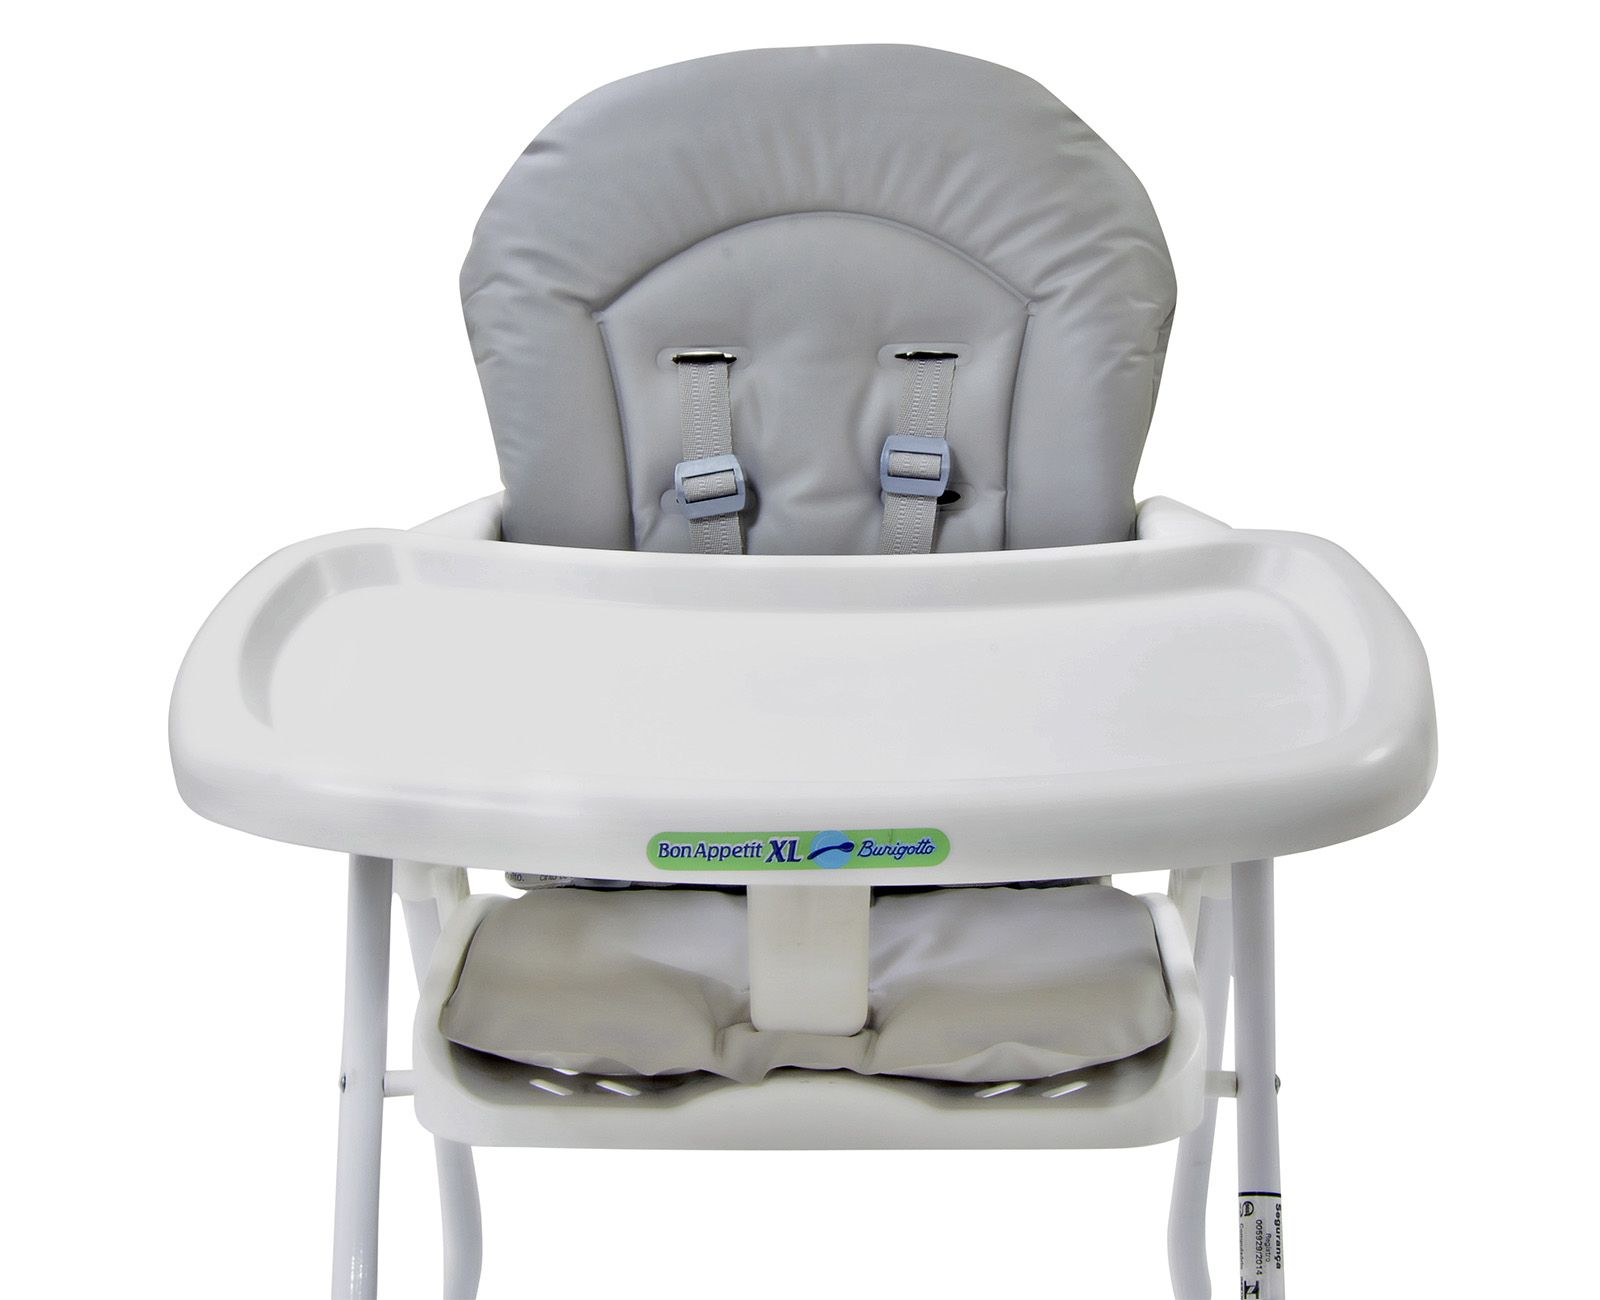 Cadeira Alimentação Bon Appetit XL Ice